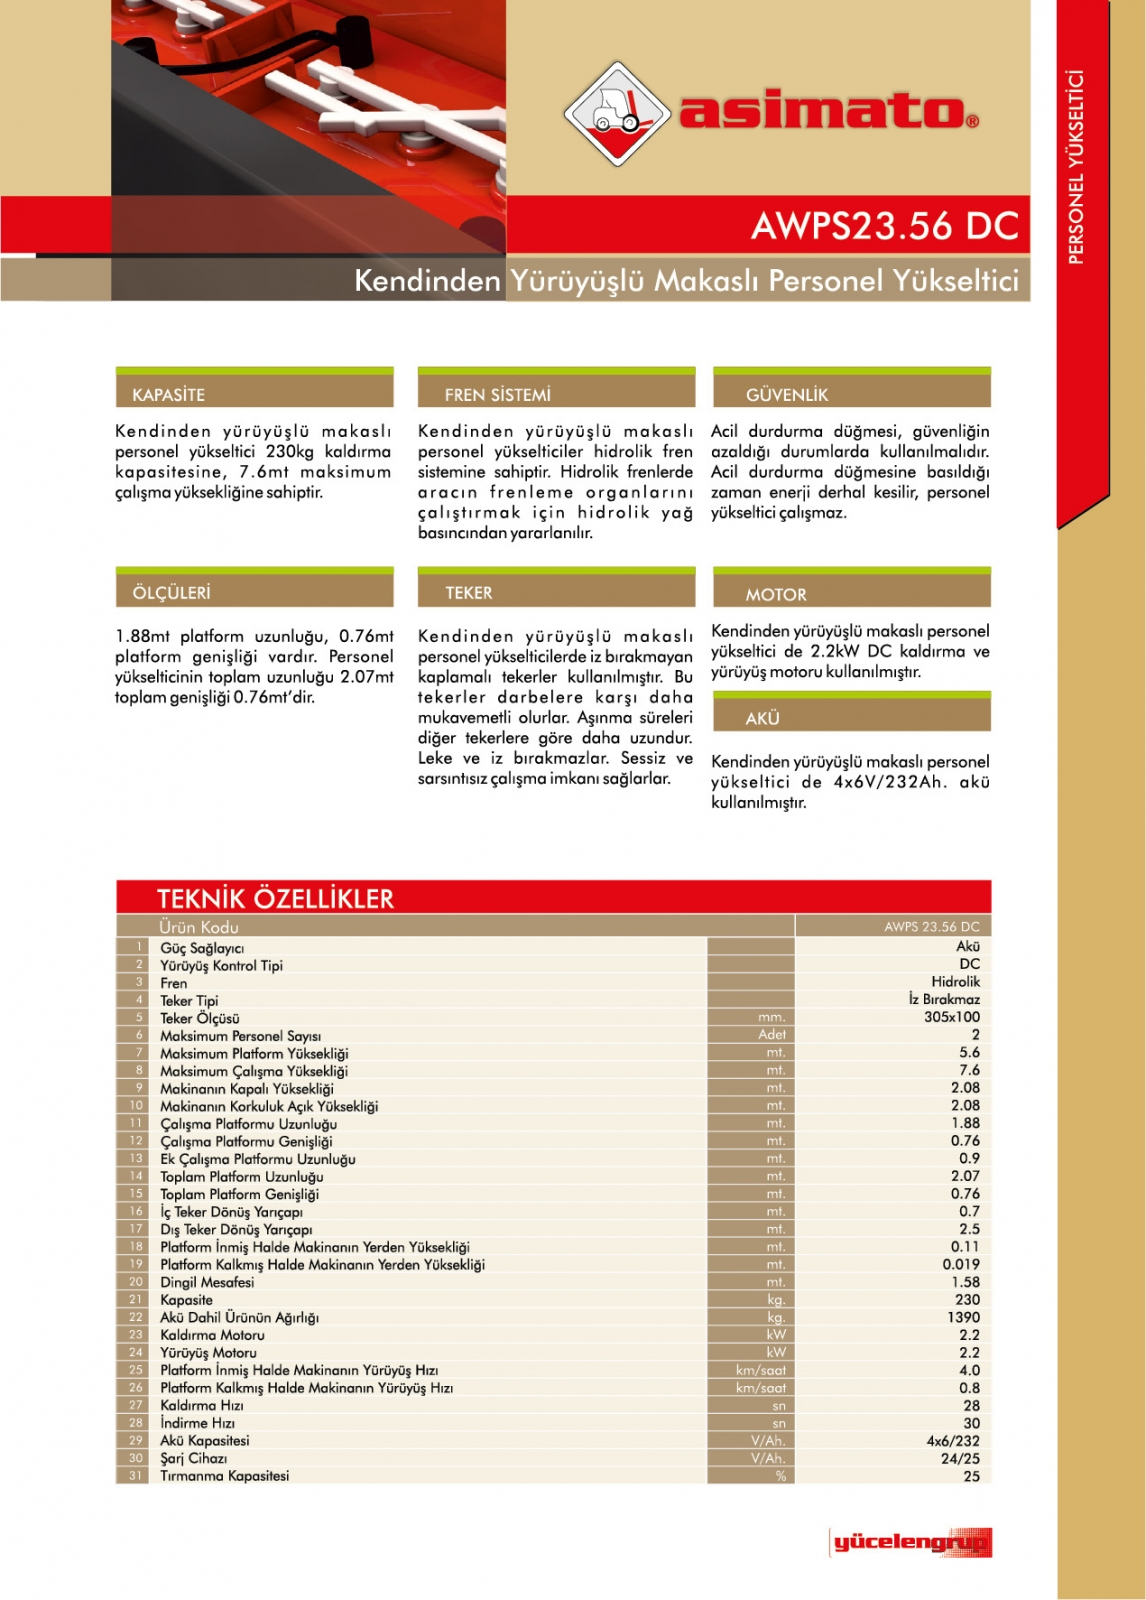 AWPS2356 SERİSİ 230 KG 7.6 METRE AKÜLÜ MAKASLI PERSONEL YÜKSELTİCİ